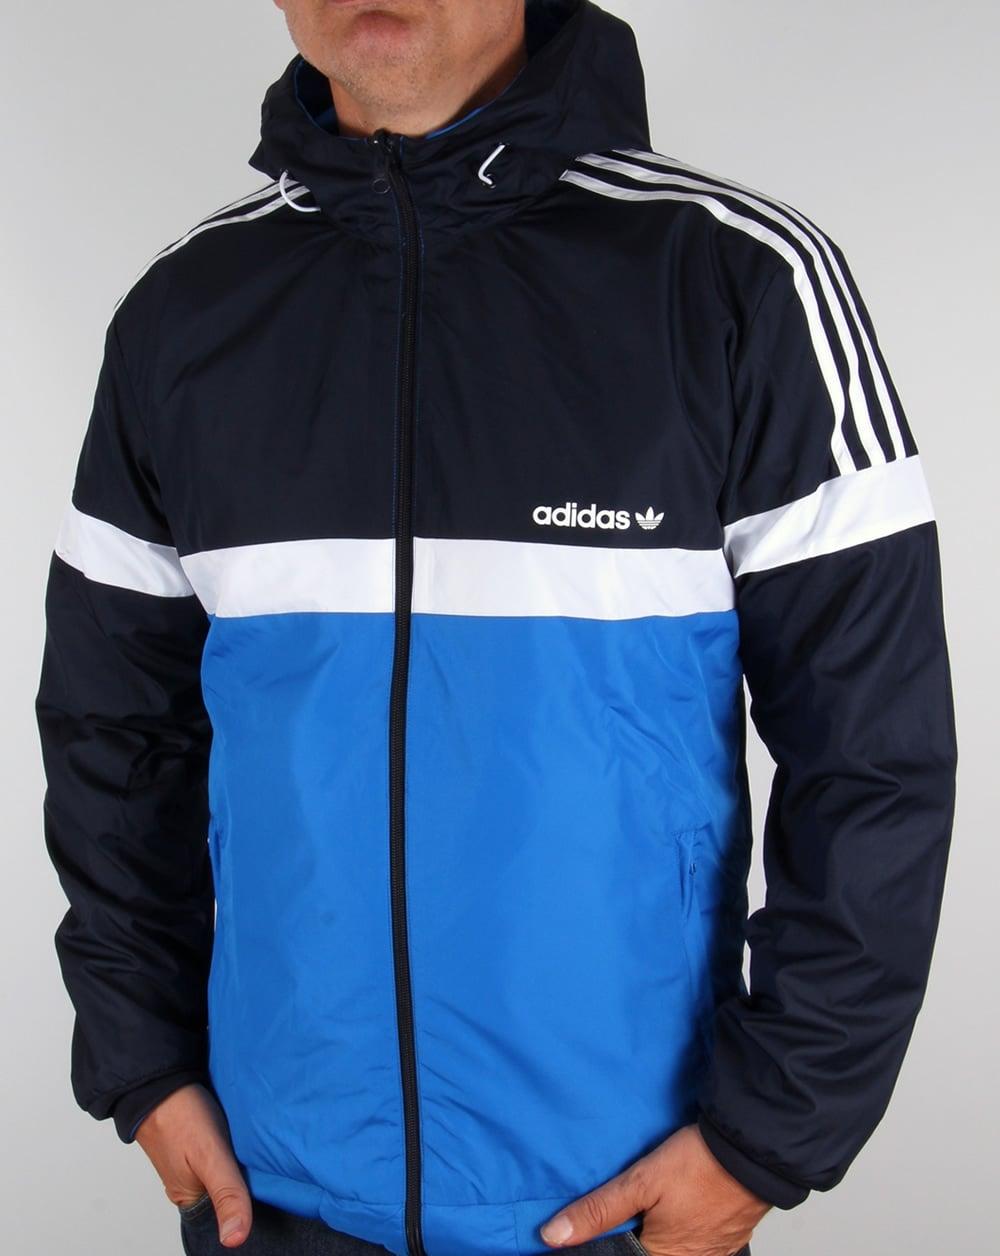 Adidas Originals Reversible Windbreaker Navy/Bluebird,retro, mens ...